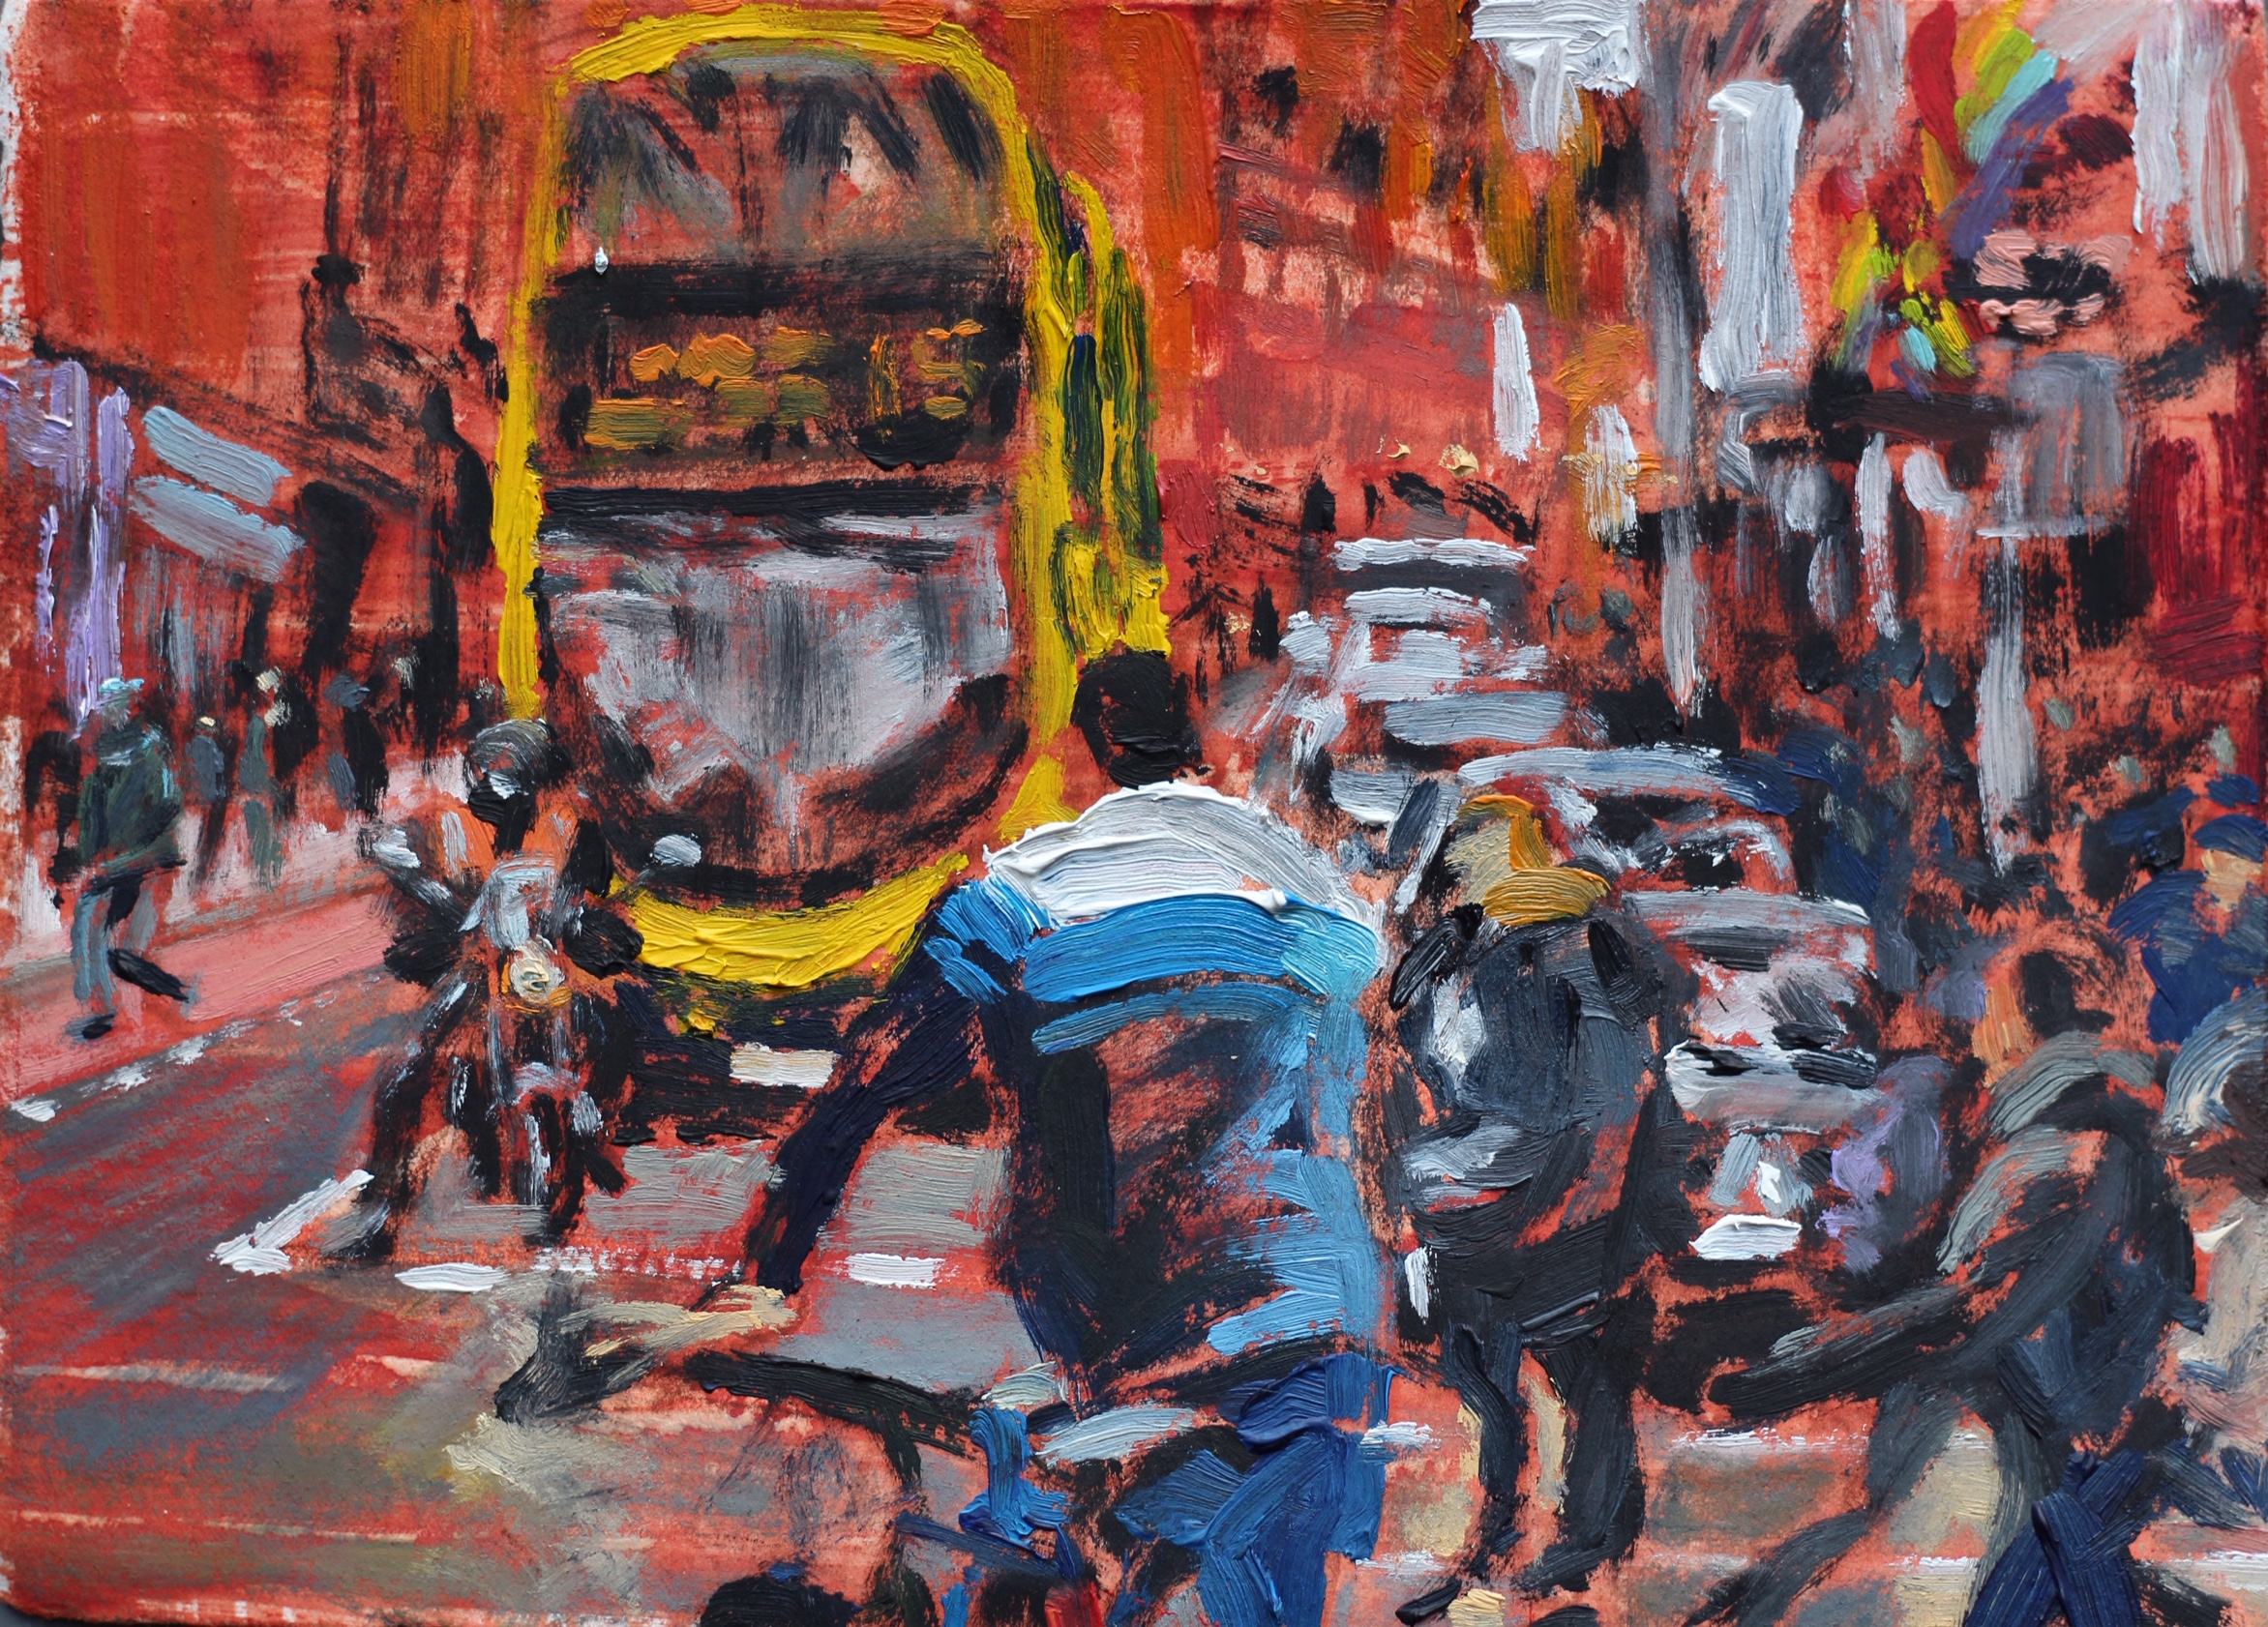 The Rush on George's Street 2 - 15x20cm